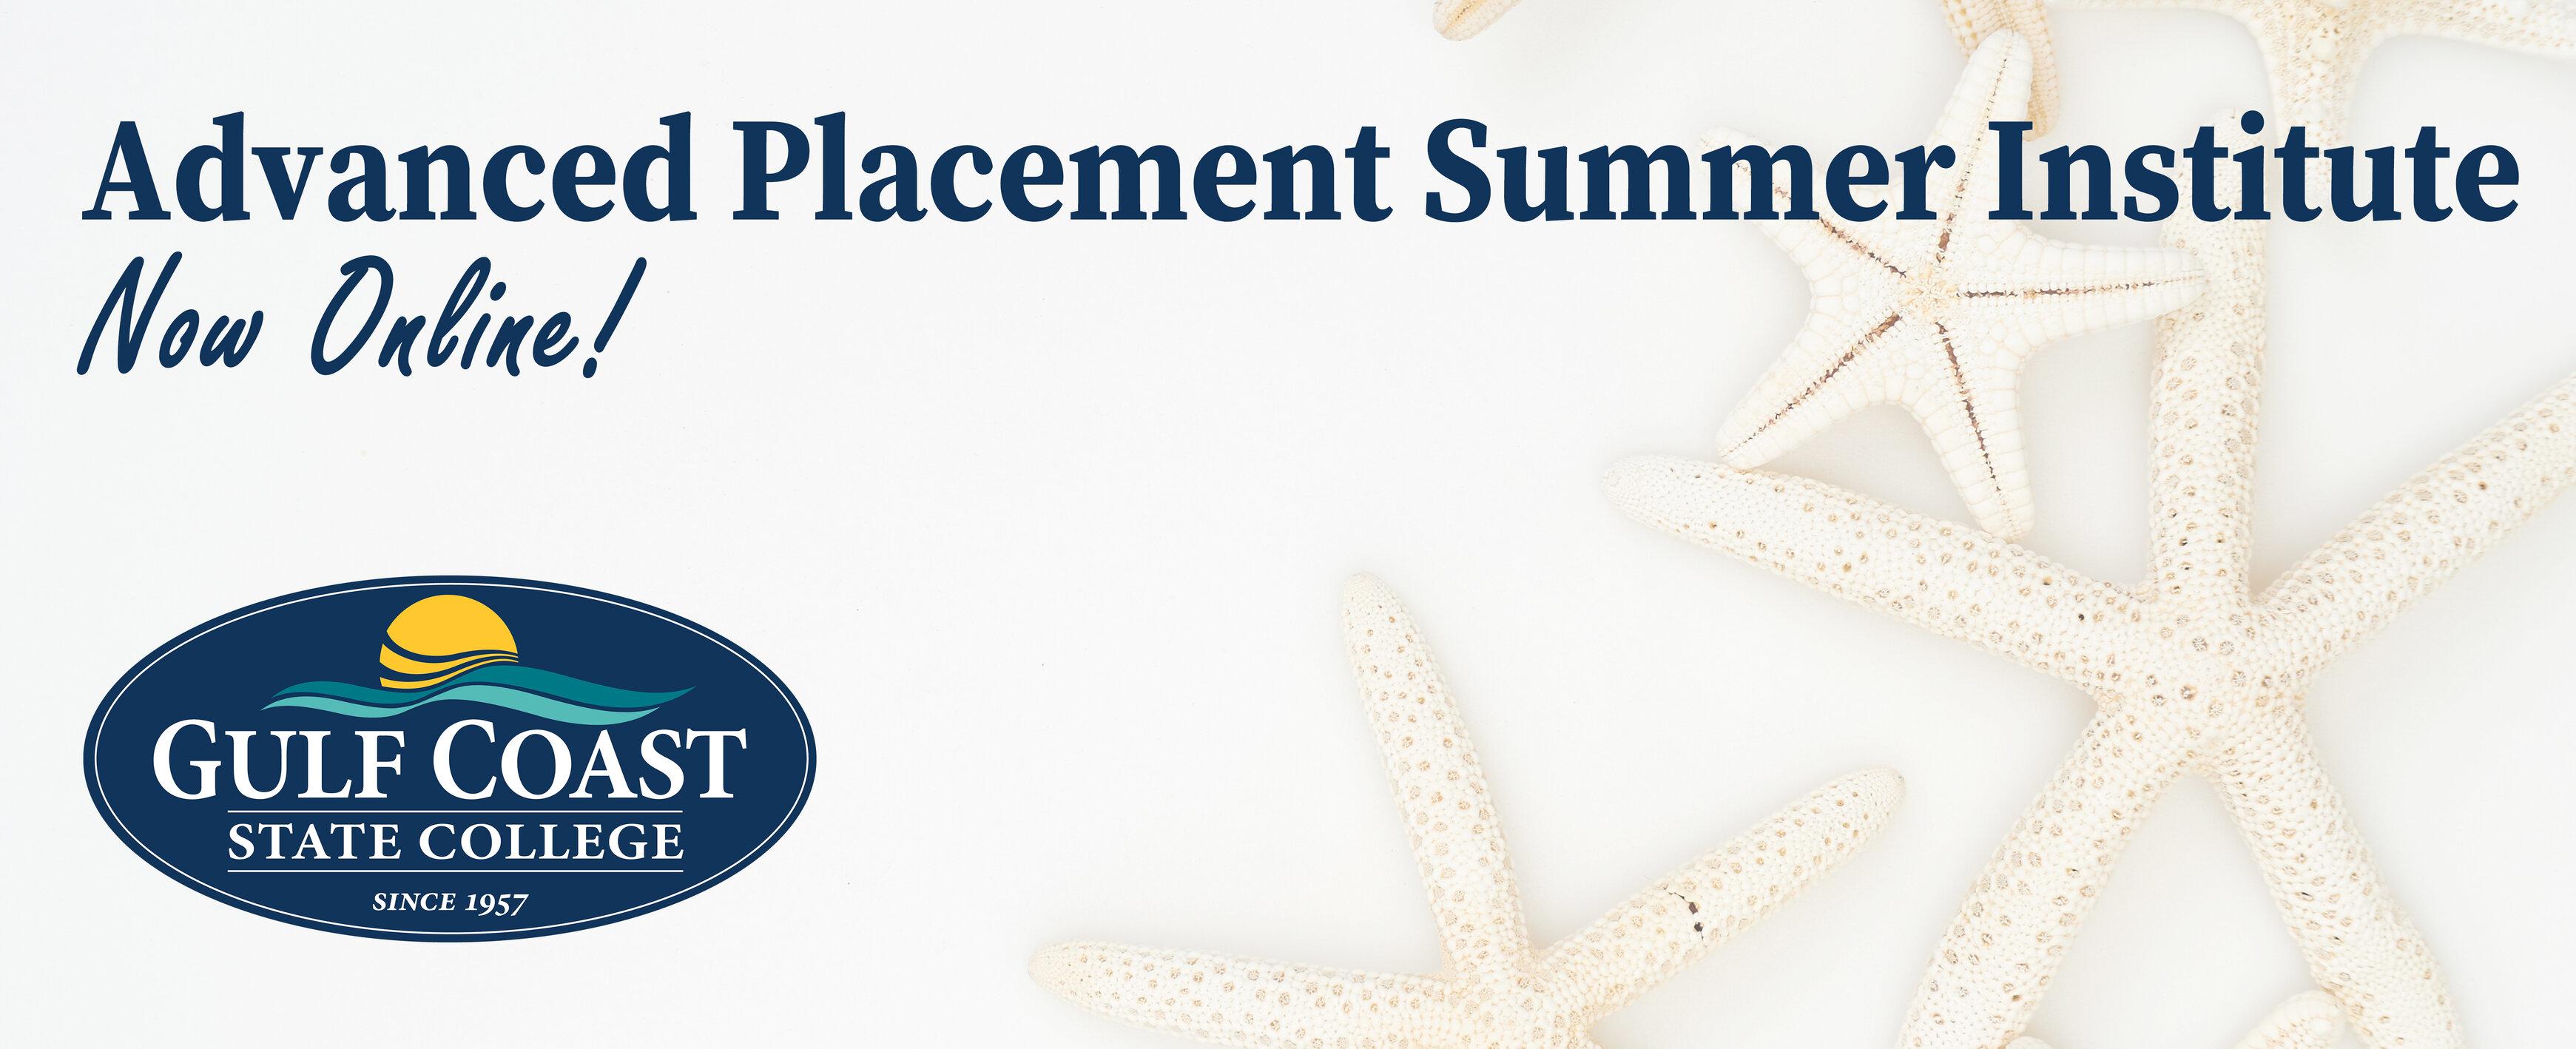 Gulf Coast State College APSI Online - Week 2